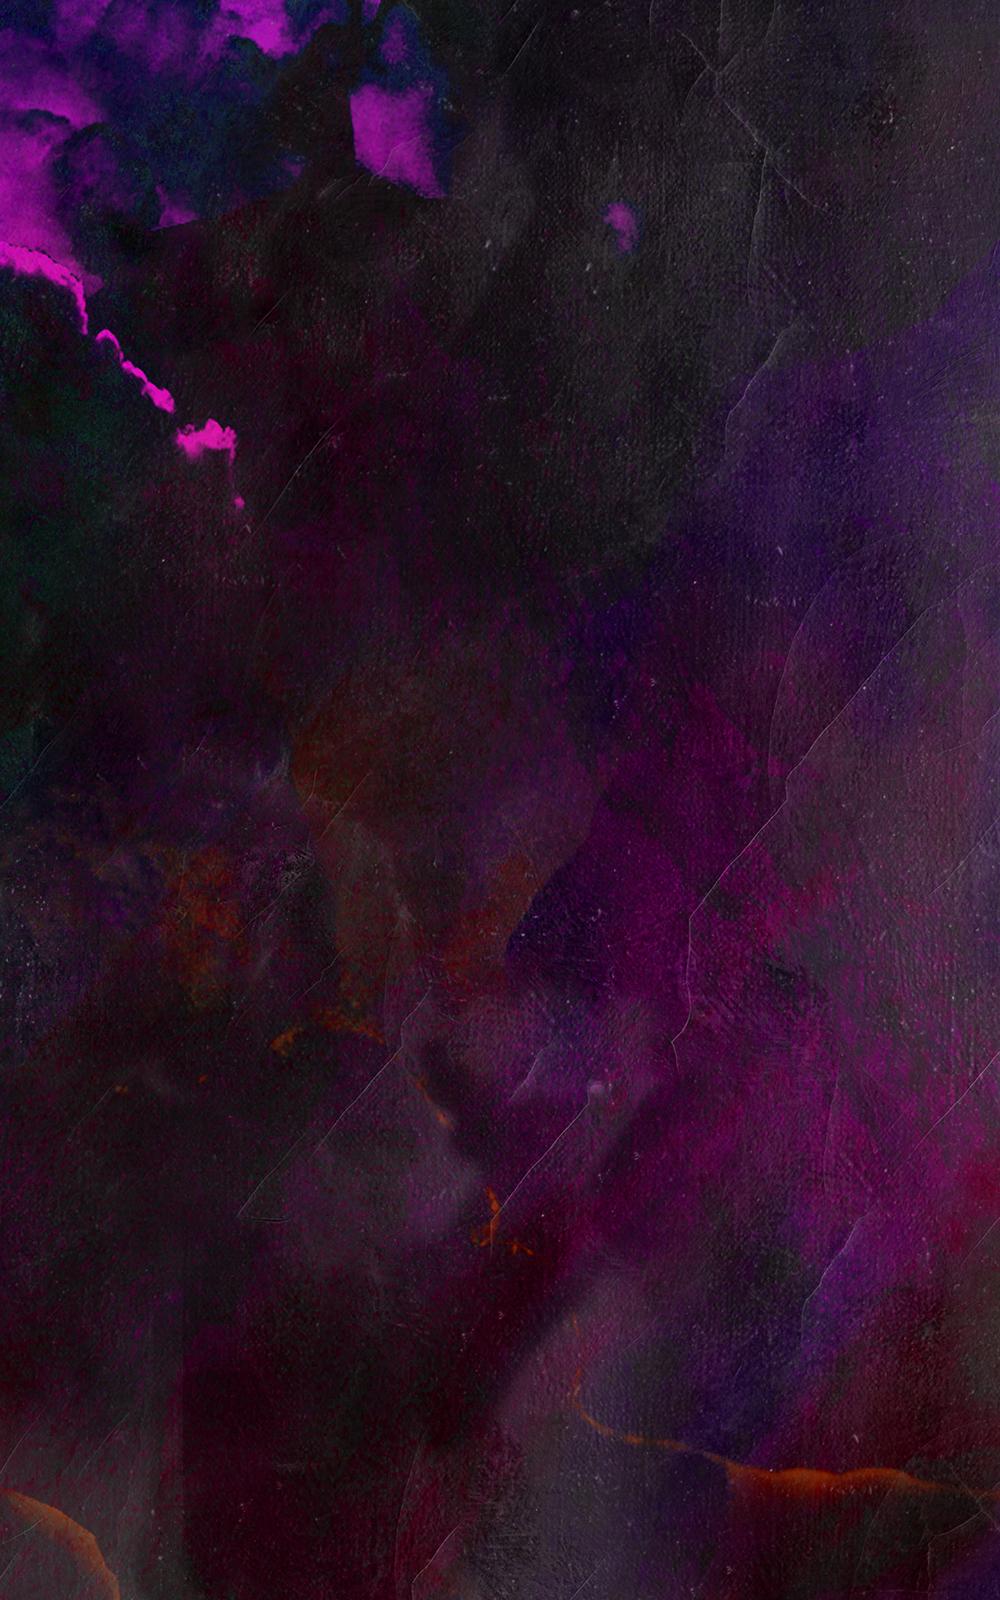 Case Simmons, Simmons & Burke, If Not Winter Composite #5, Kohn Gallery, Composite Image, Lightjet Print, Digital Collage,Digital Art, Photoshop Collage, Contemporary Collage,Case Simmons Art, Case Simmons Artist, Collage Fine Art, Hyper Collage, Digital Painting,Digital Landscape